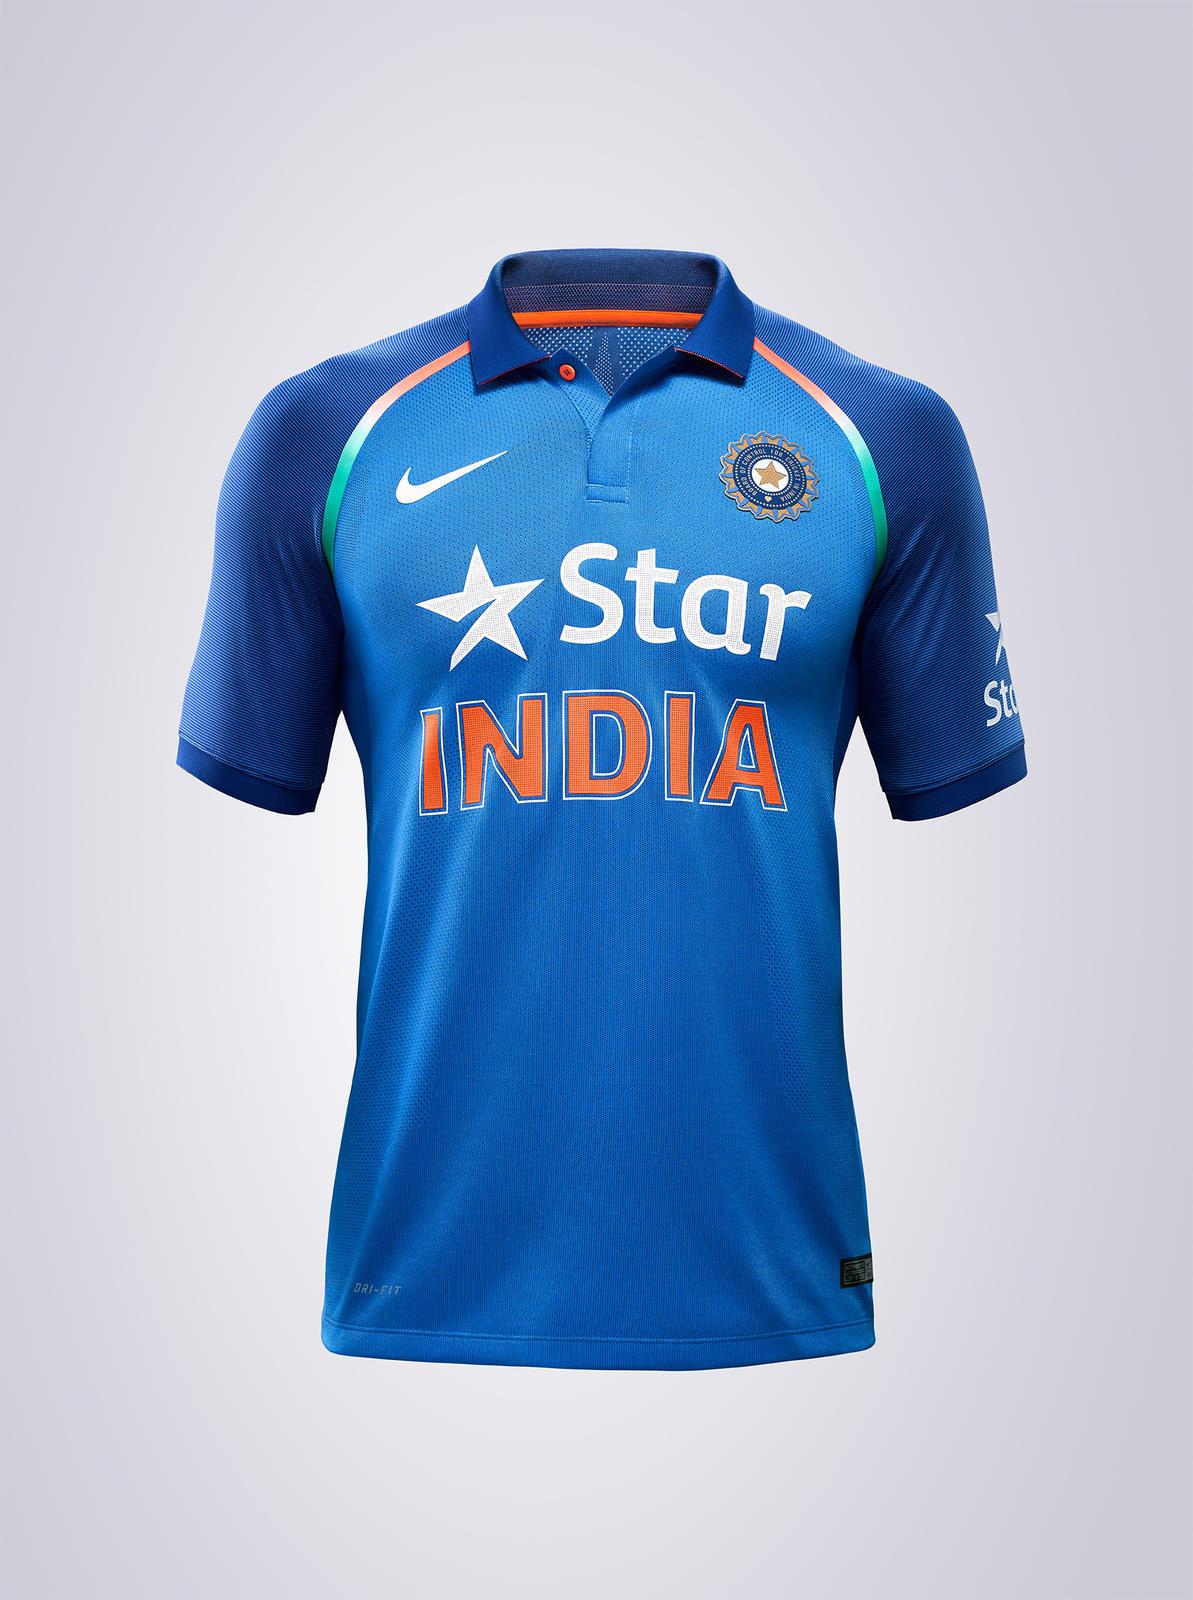 79d52876 Nike Unveils New Team India Cricket Kit - Nike News